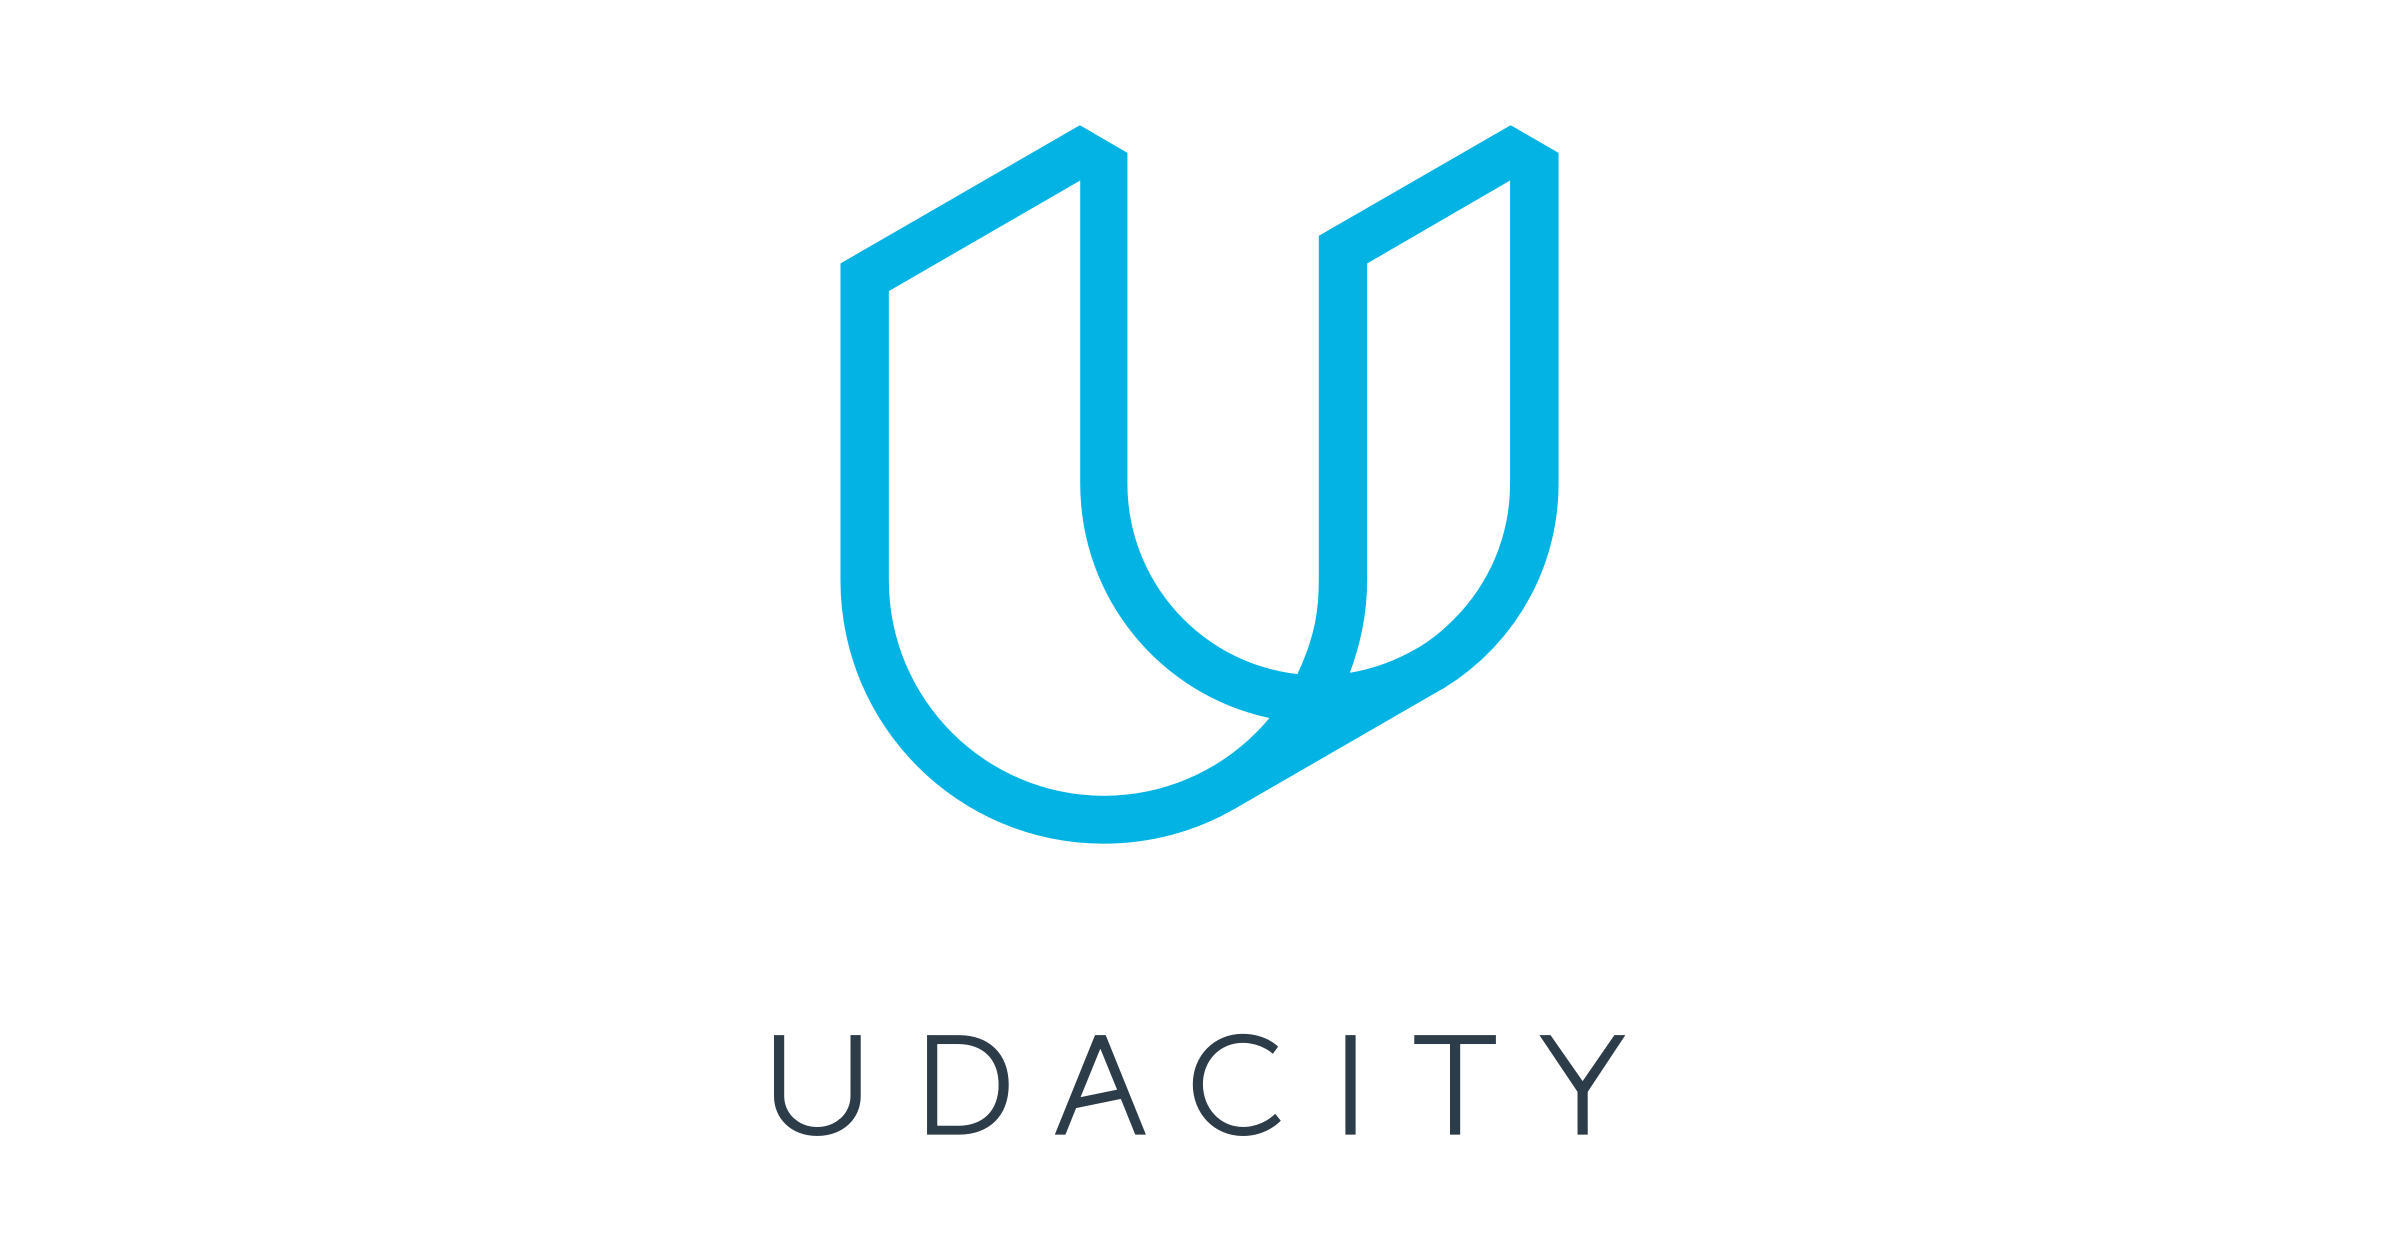 udacity_share